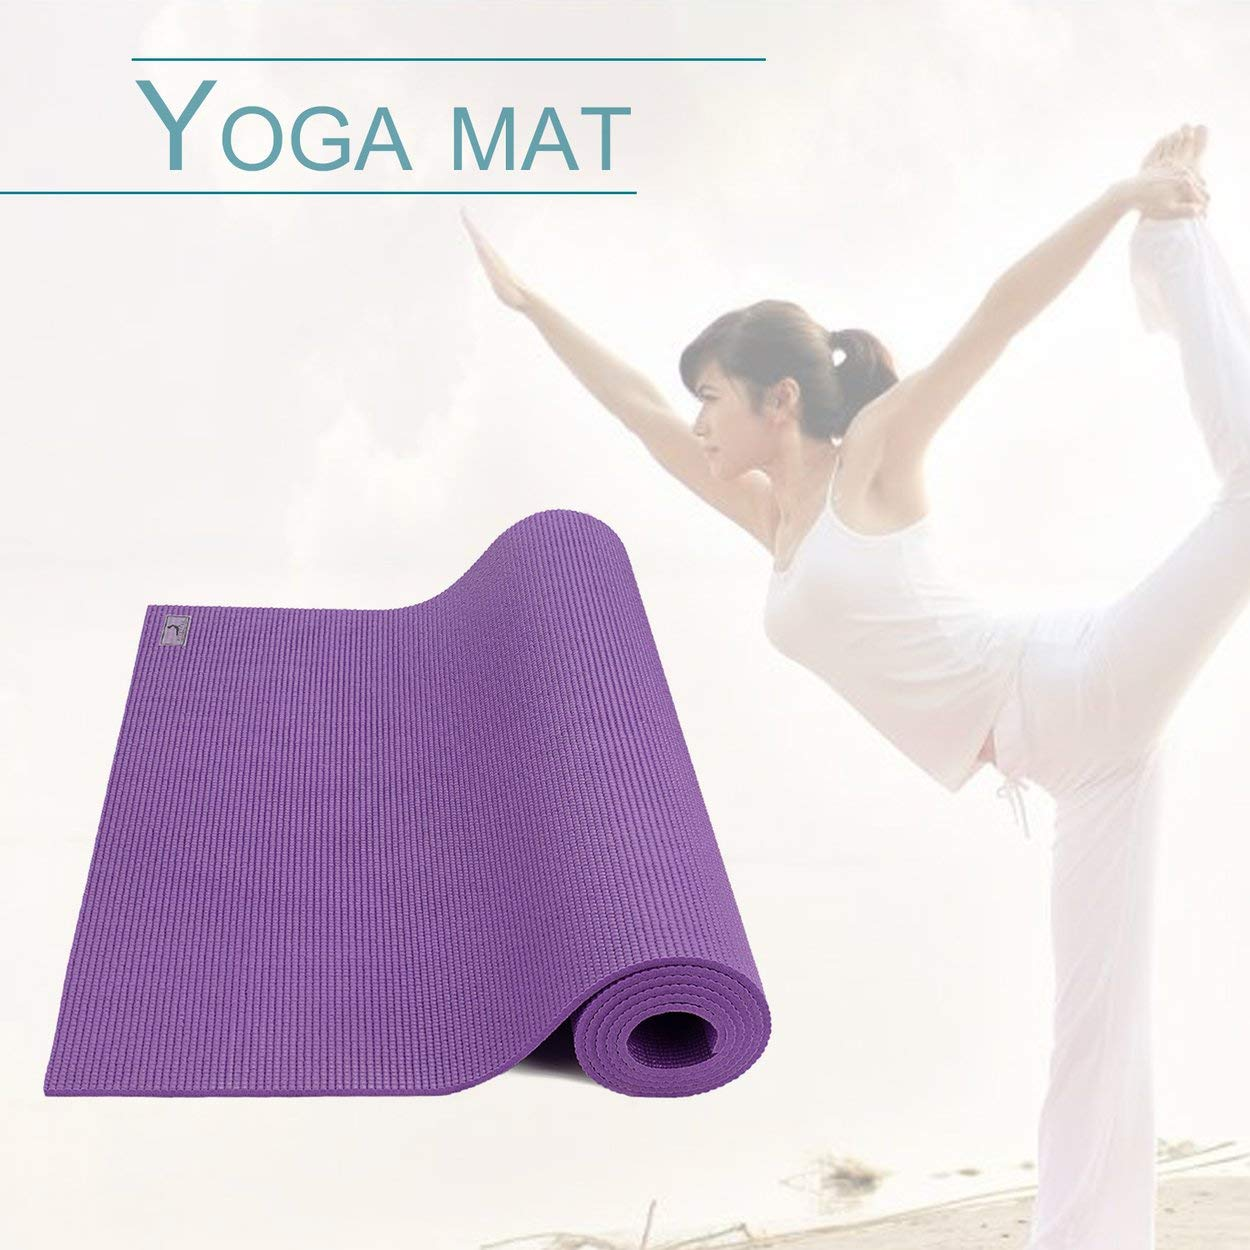 Lorenlli Ajuste PIERYOGA 6mm Estera de Yoga Gruesa PVC Color ...